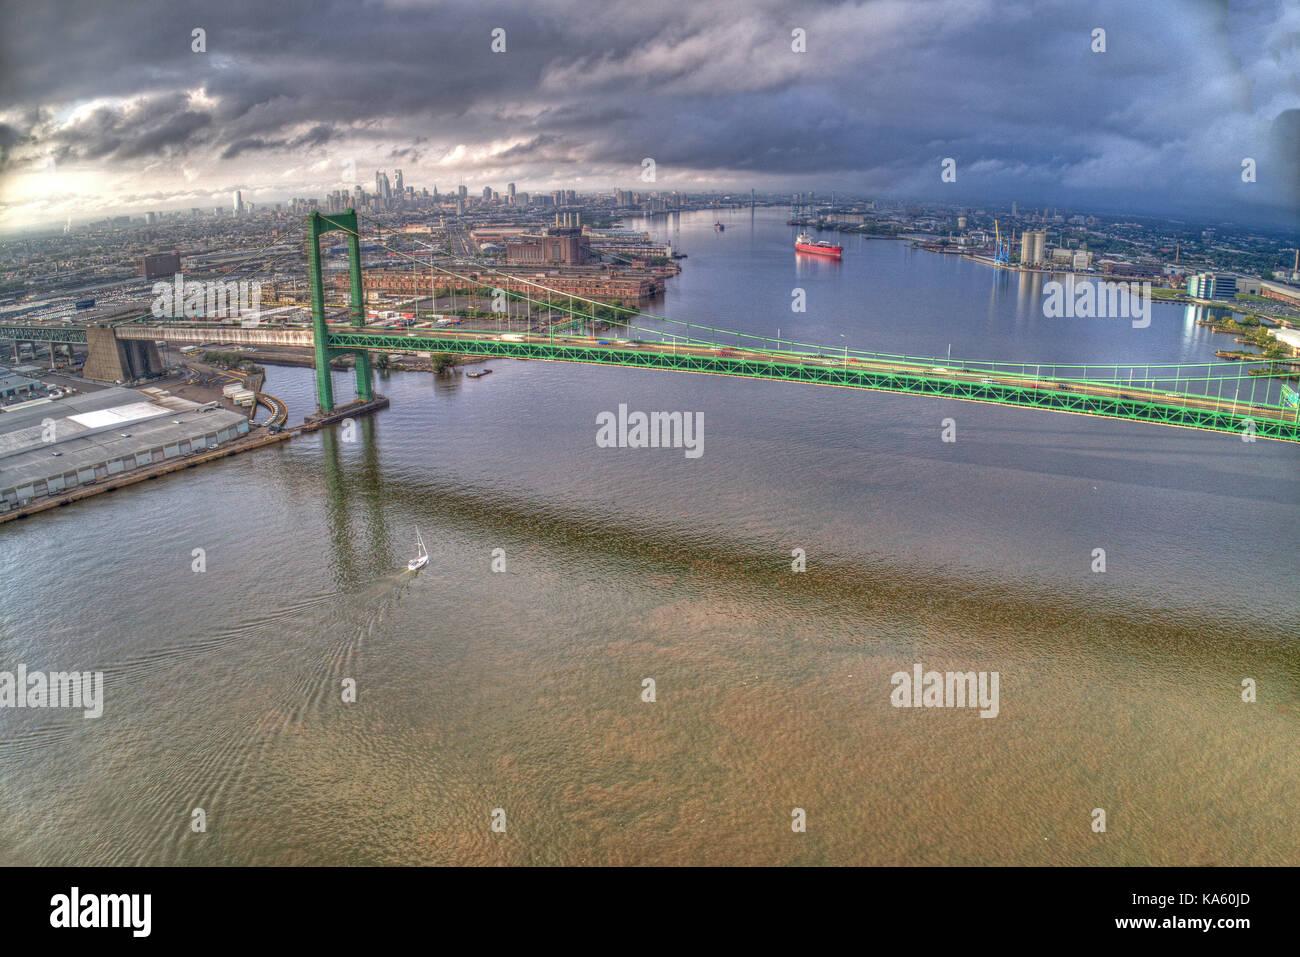 Aerial of Walt Whitman Bridge Looking Towards Center City Philadelphia - Stock Image